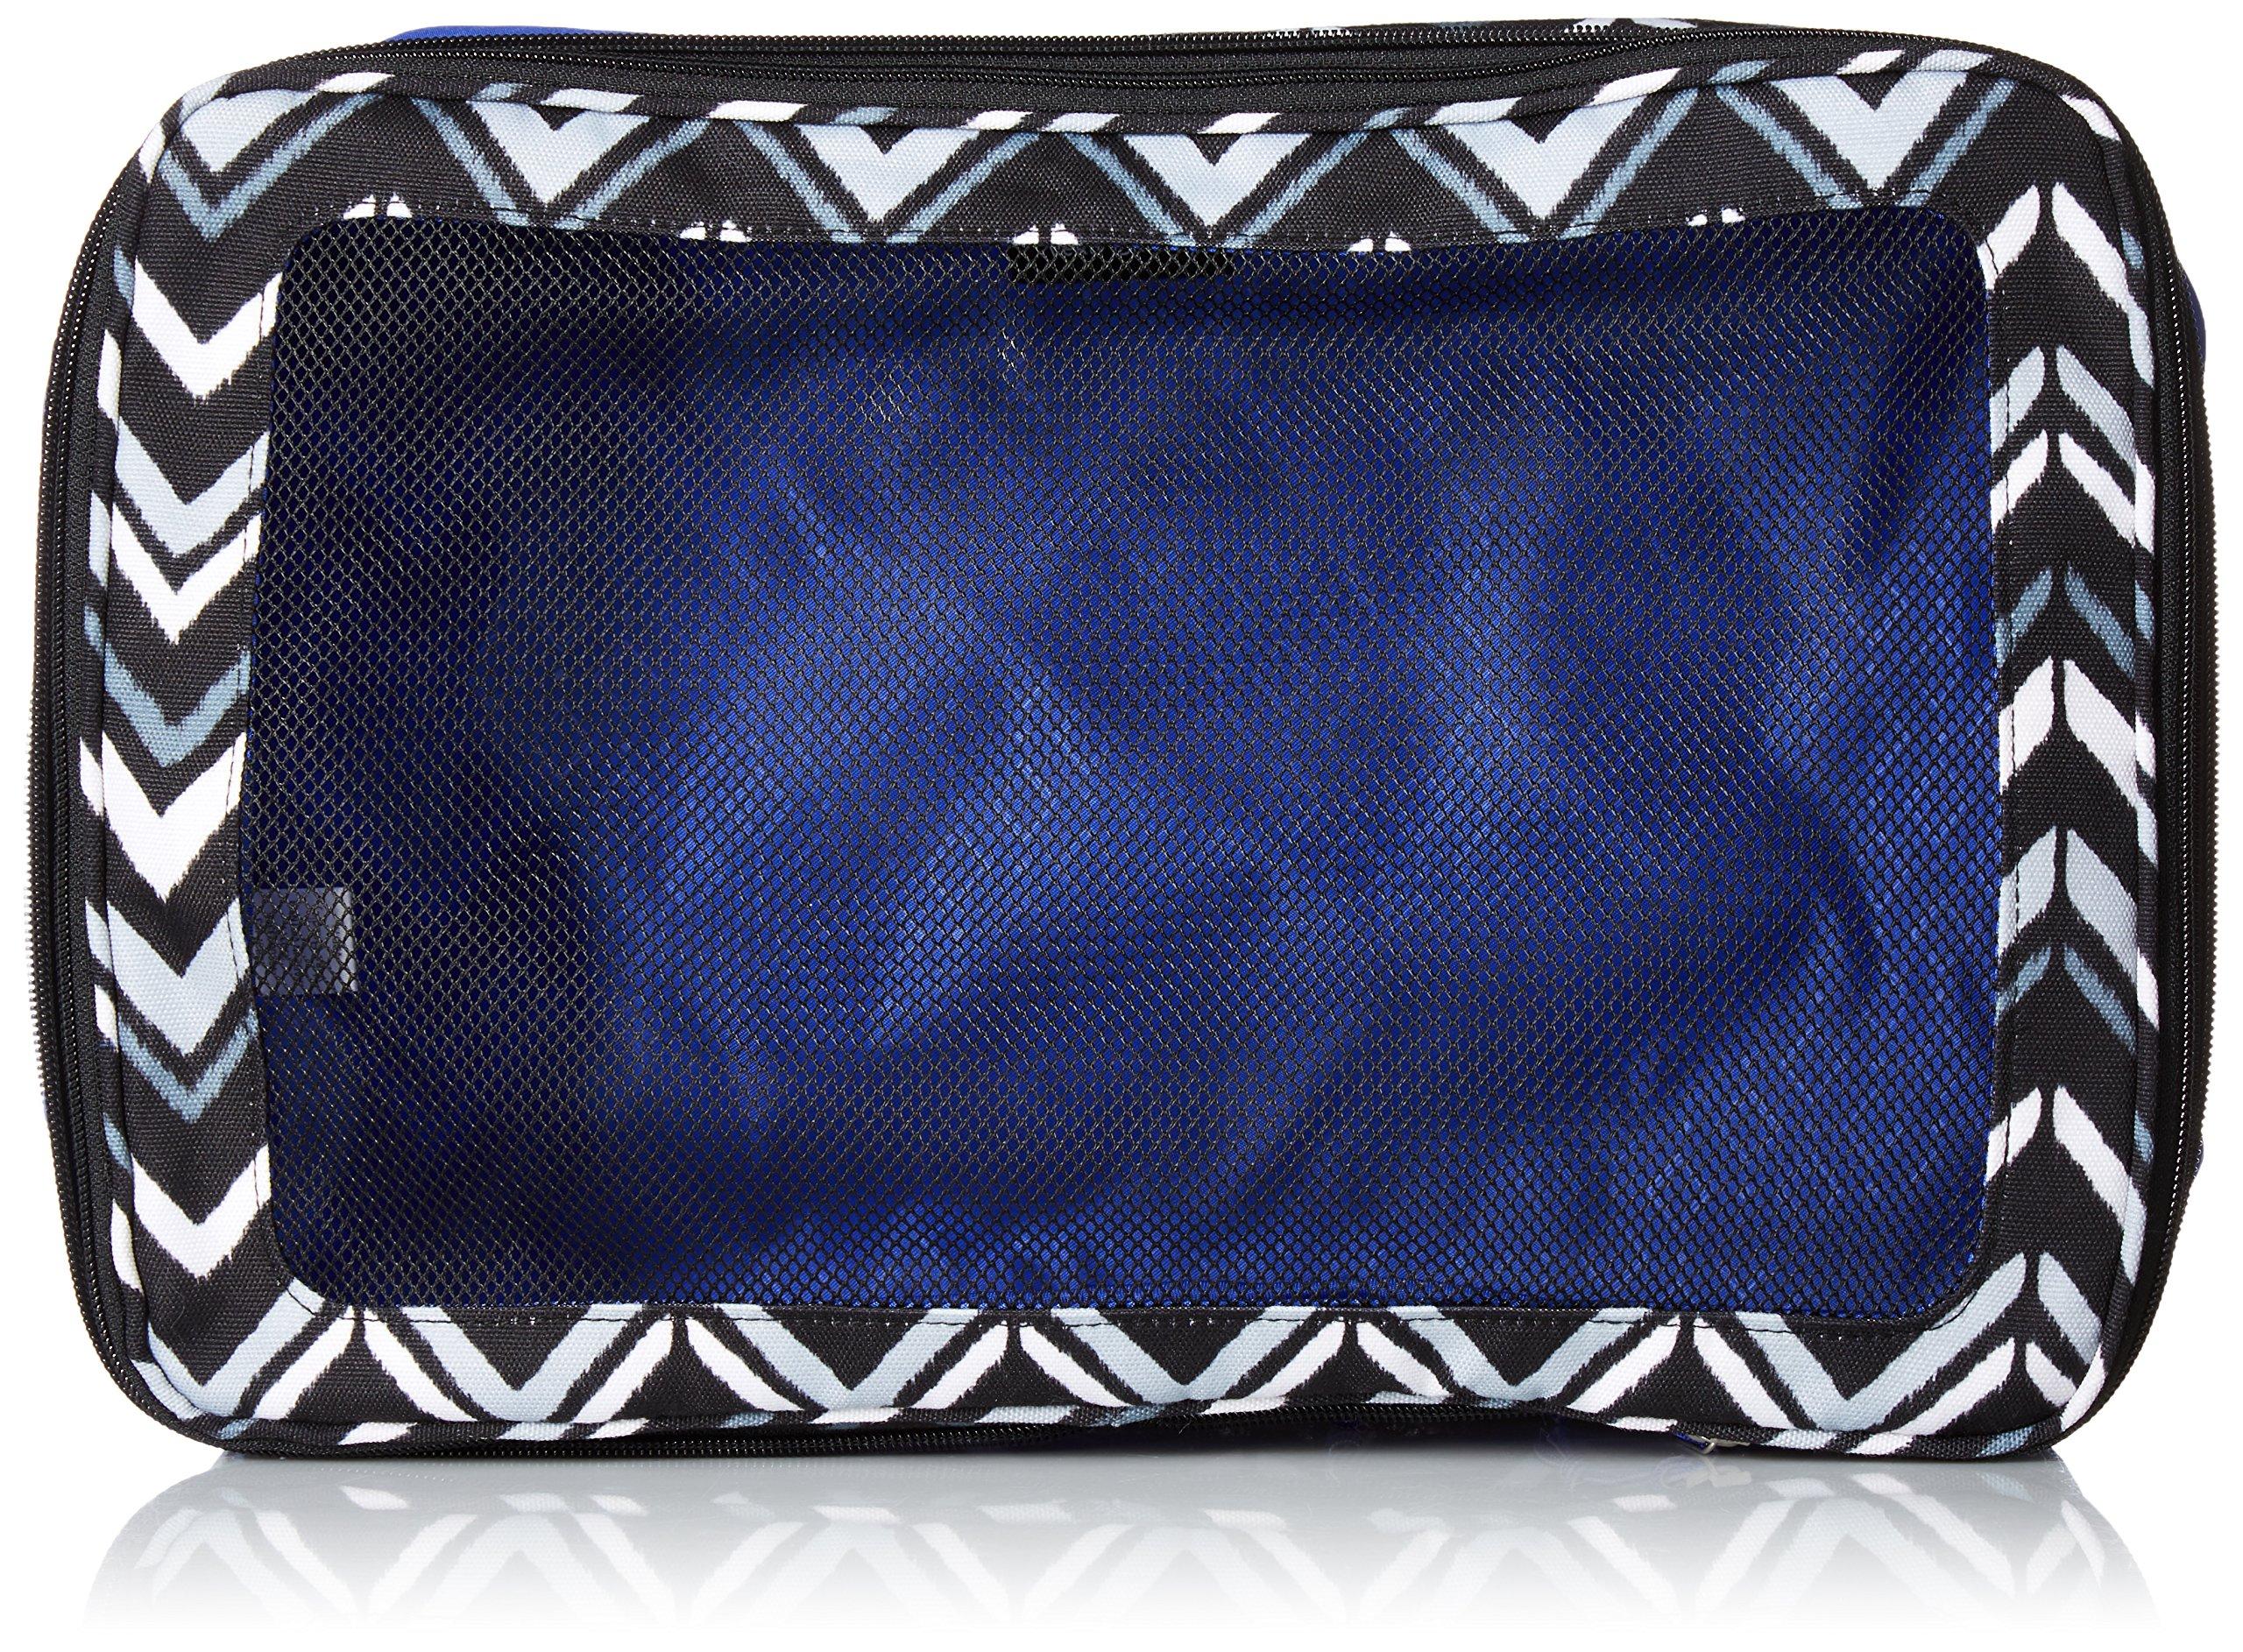 Vera Bradley Lighten Up Large Expandable Packing Cube, Polyester, Lotus Chevron